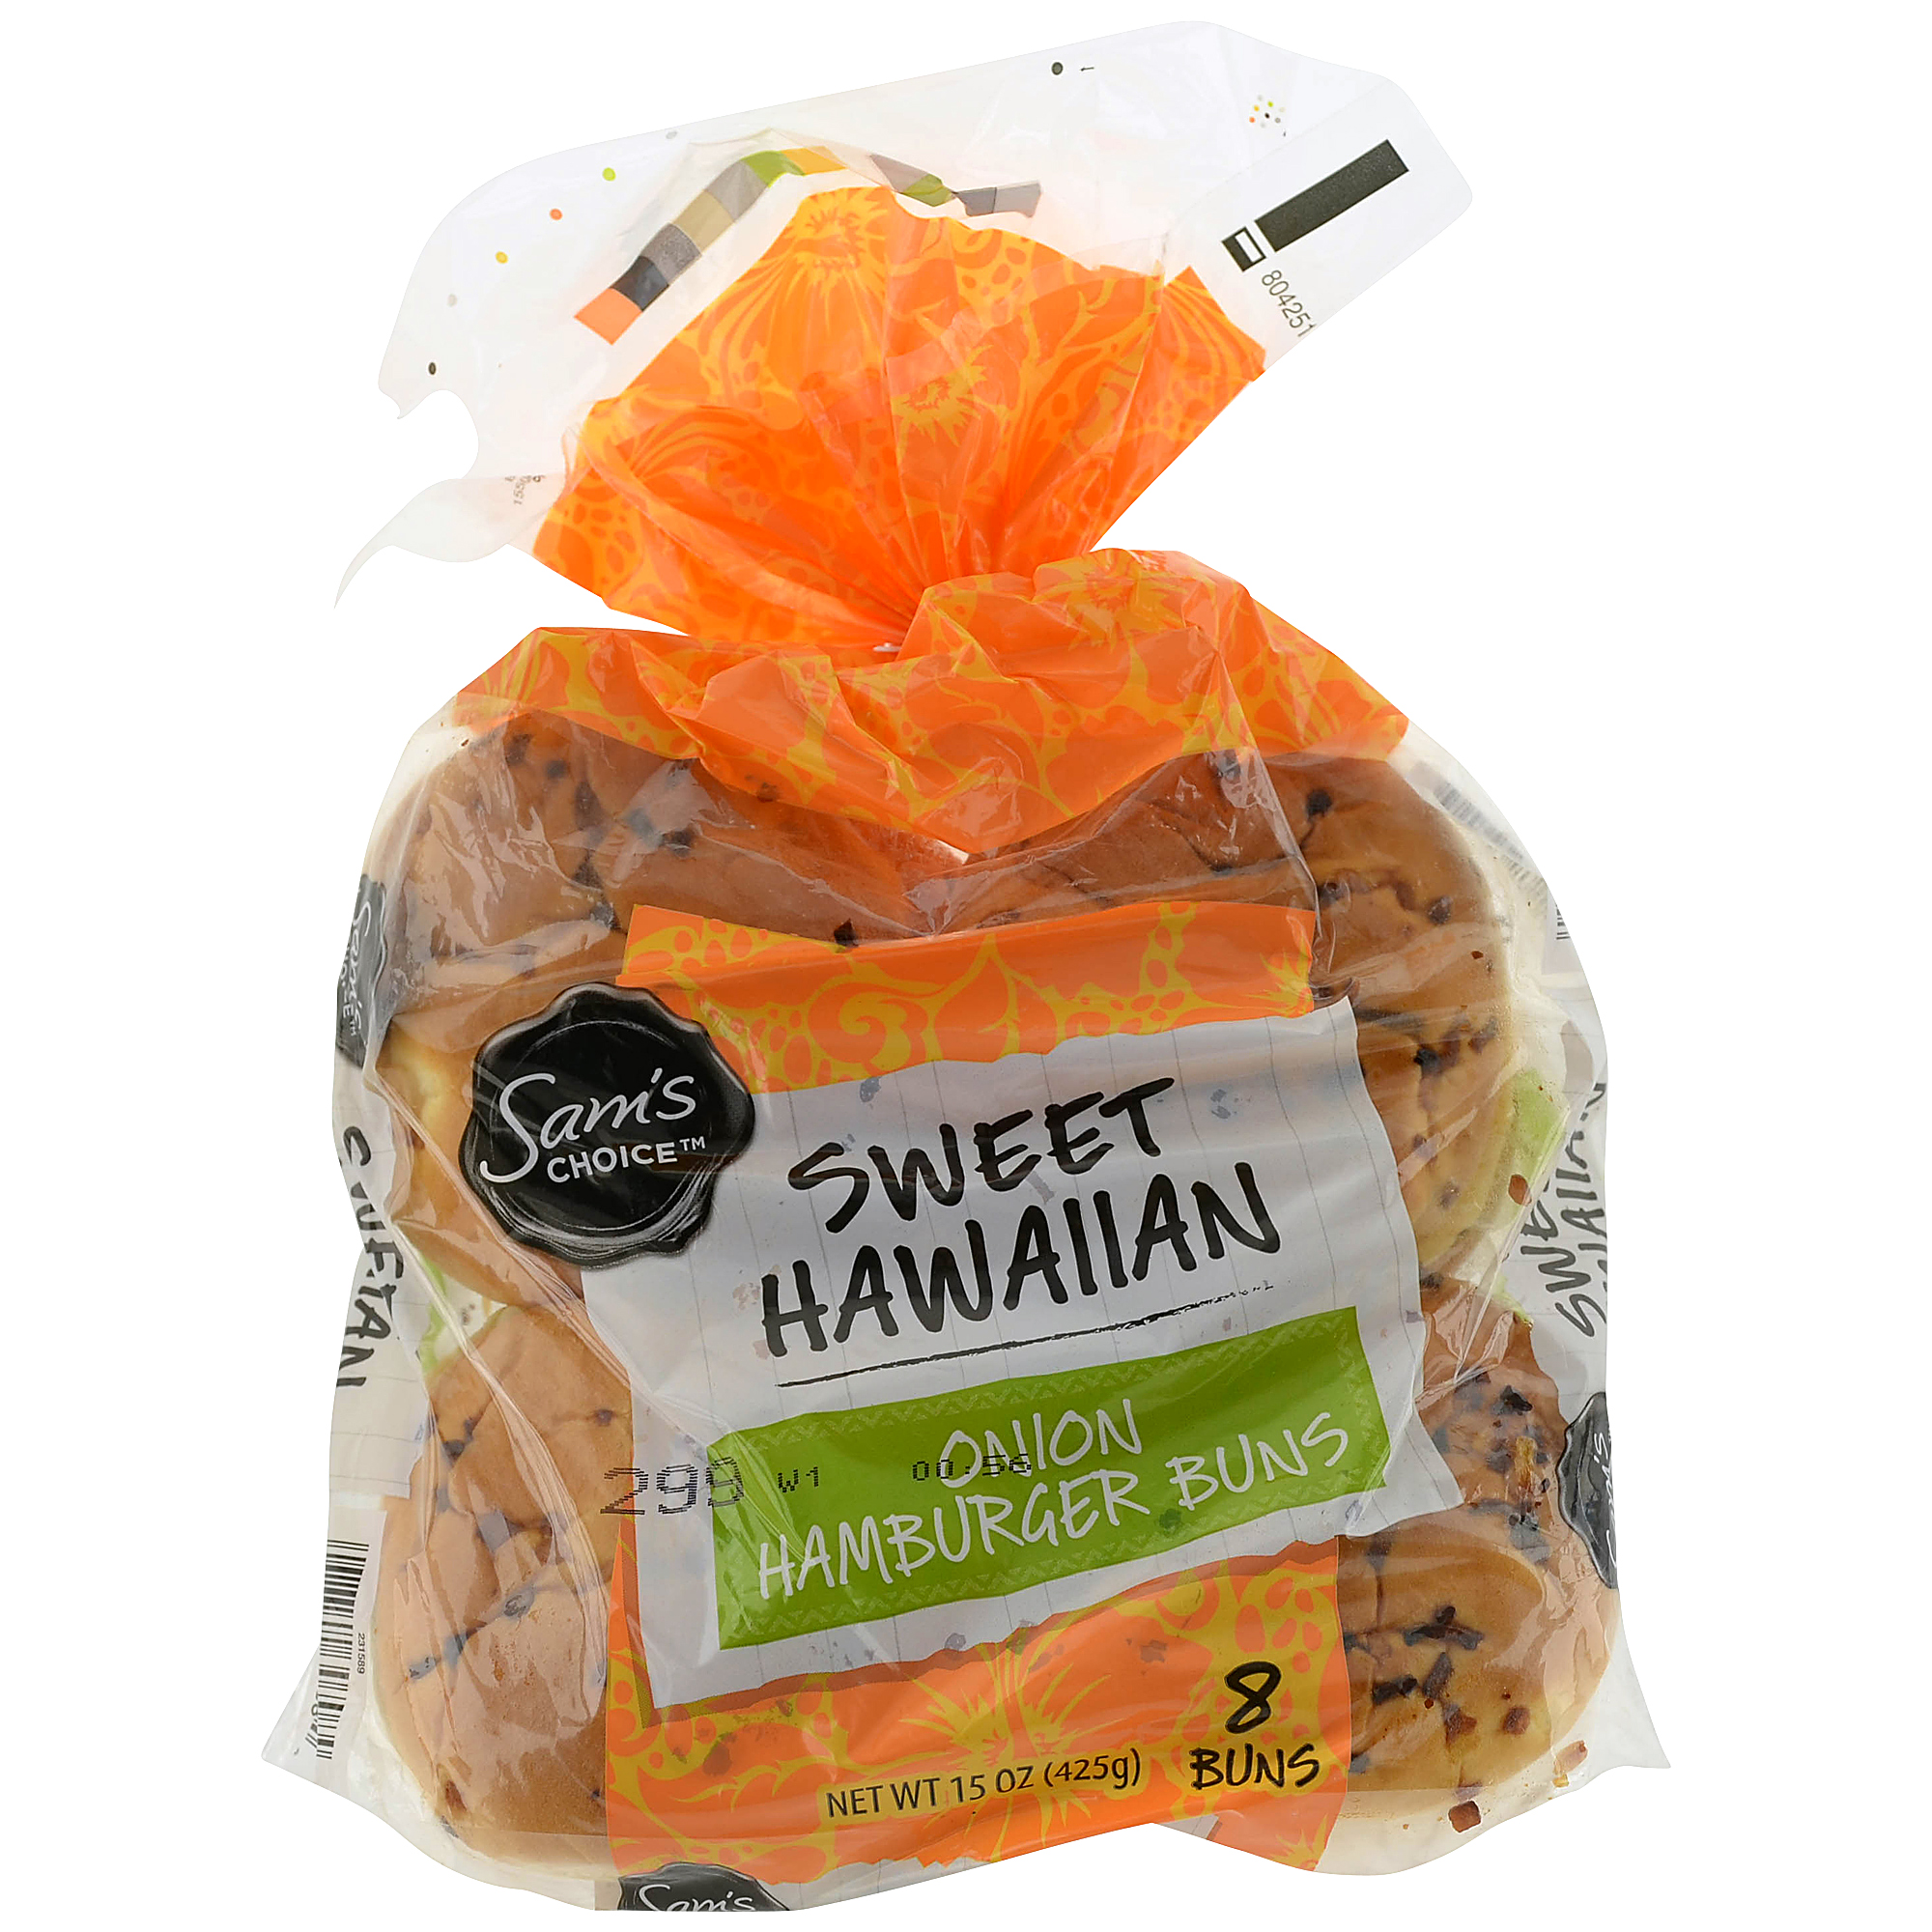 Sam's Choice Sweet Hawaiian Onion Hamburger Buns, 15 oz, 8 count